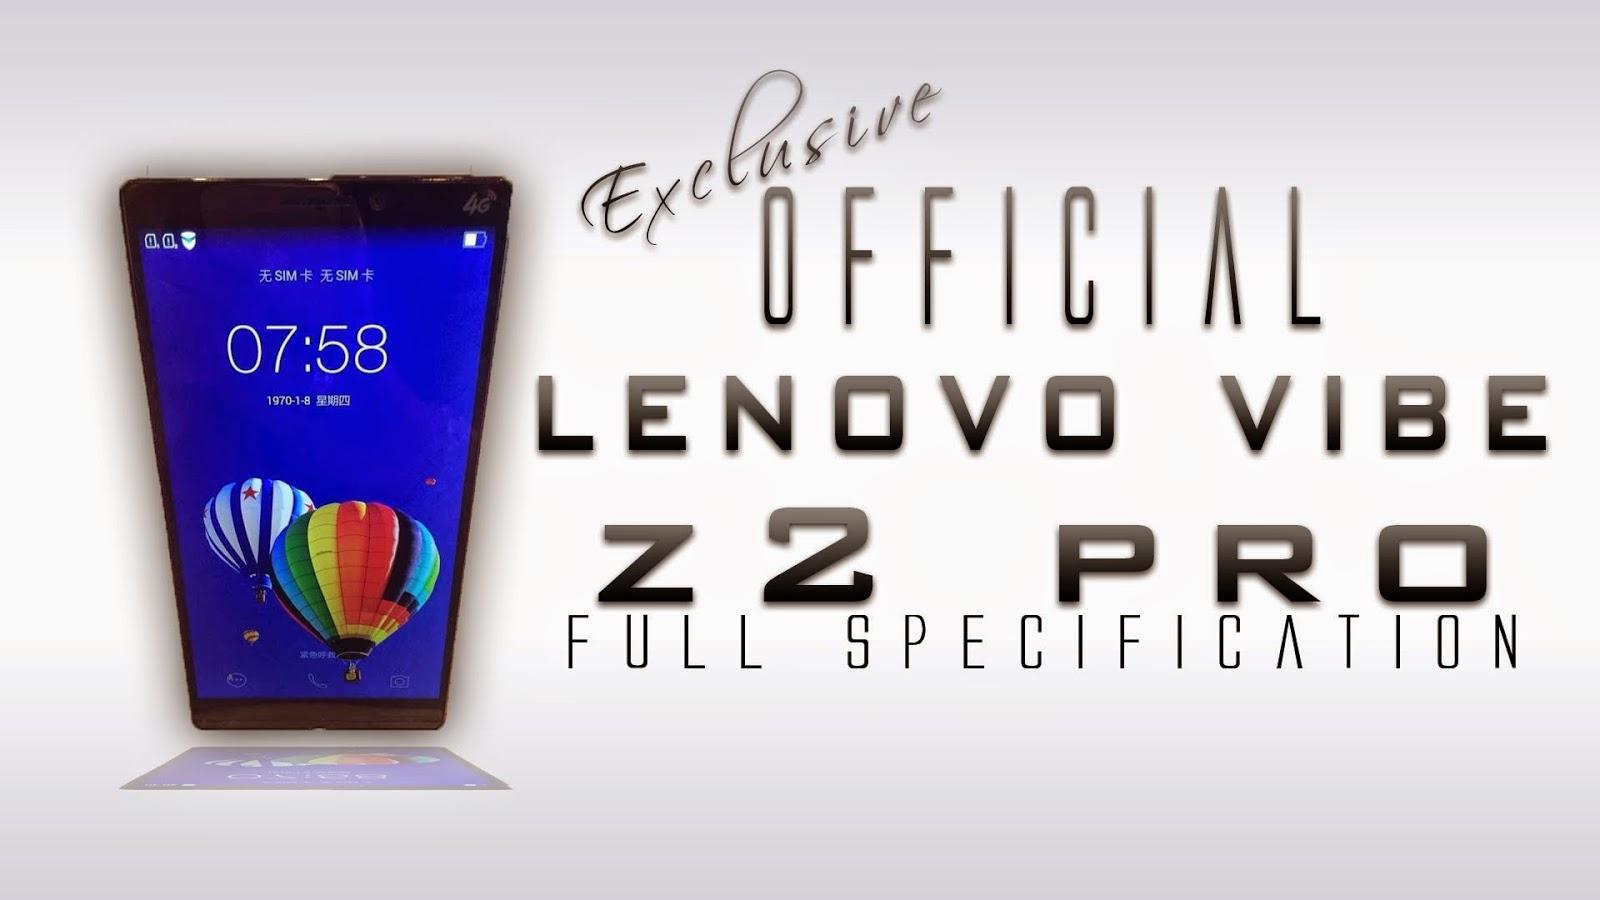 Lenovo K920, Lenovo Vibe Z2 Pro, new smartphone, 4k video recording, Ultra HD television, Vibe Z2 Pro, Qualcomm Snapdragon 801, 4G LTE, Android 4.4